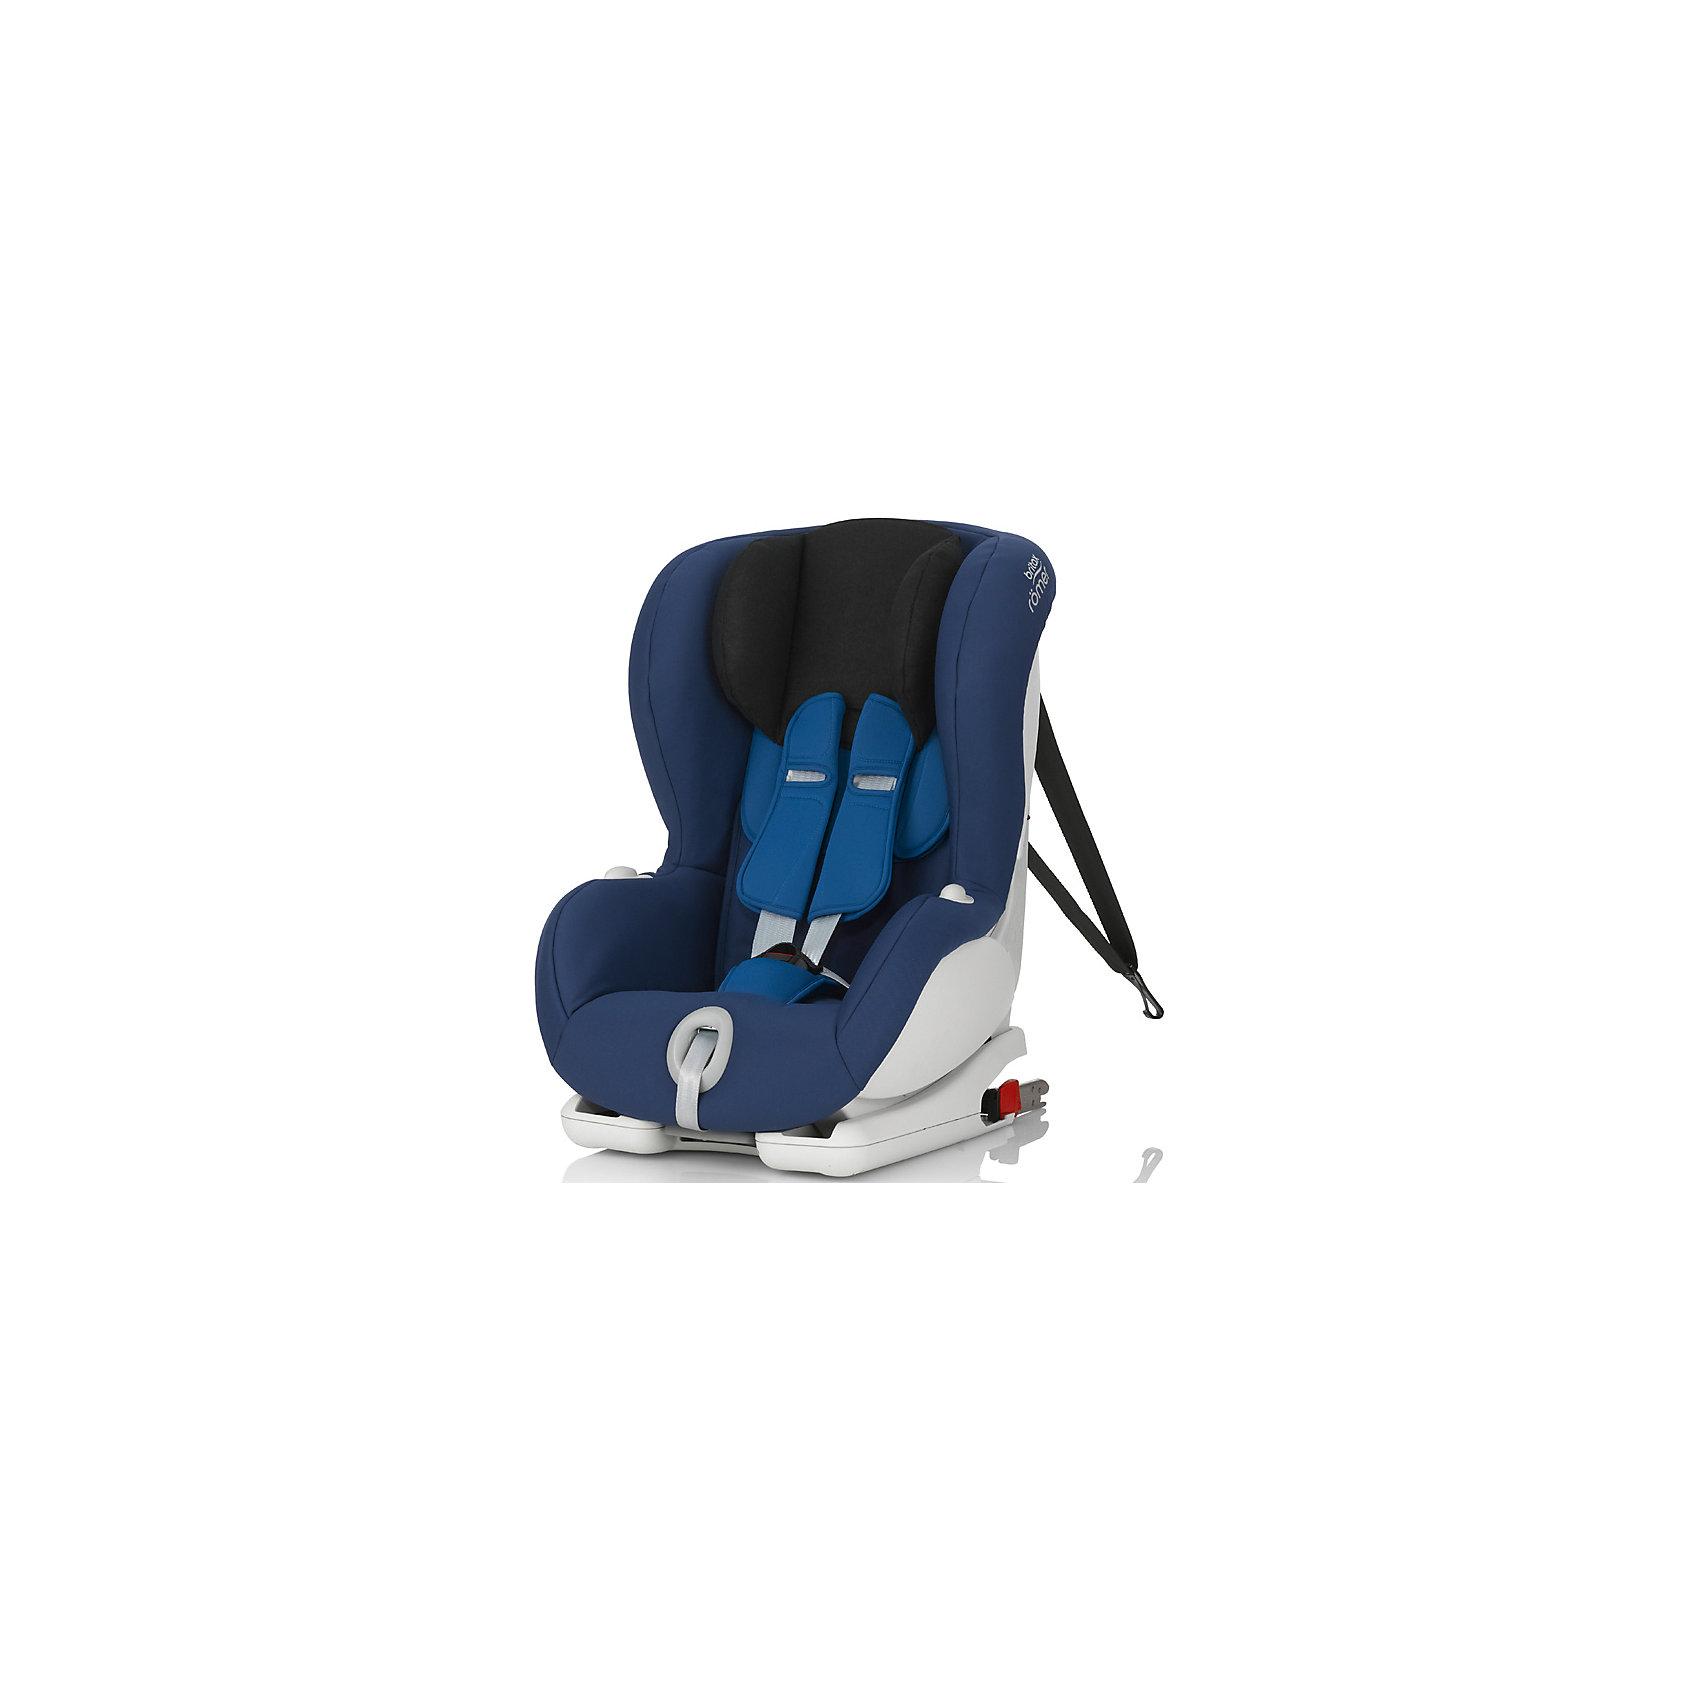 Britax Romer Автокресло Britax Romer VERSAFIX, 9-18 кг, Ocean Blue